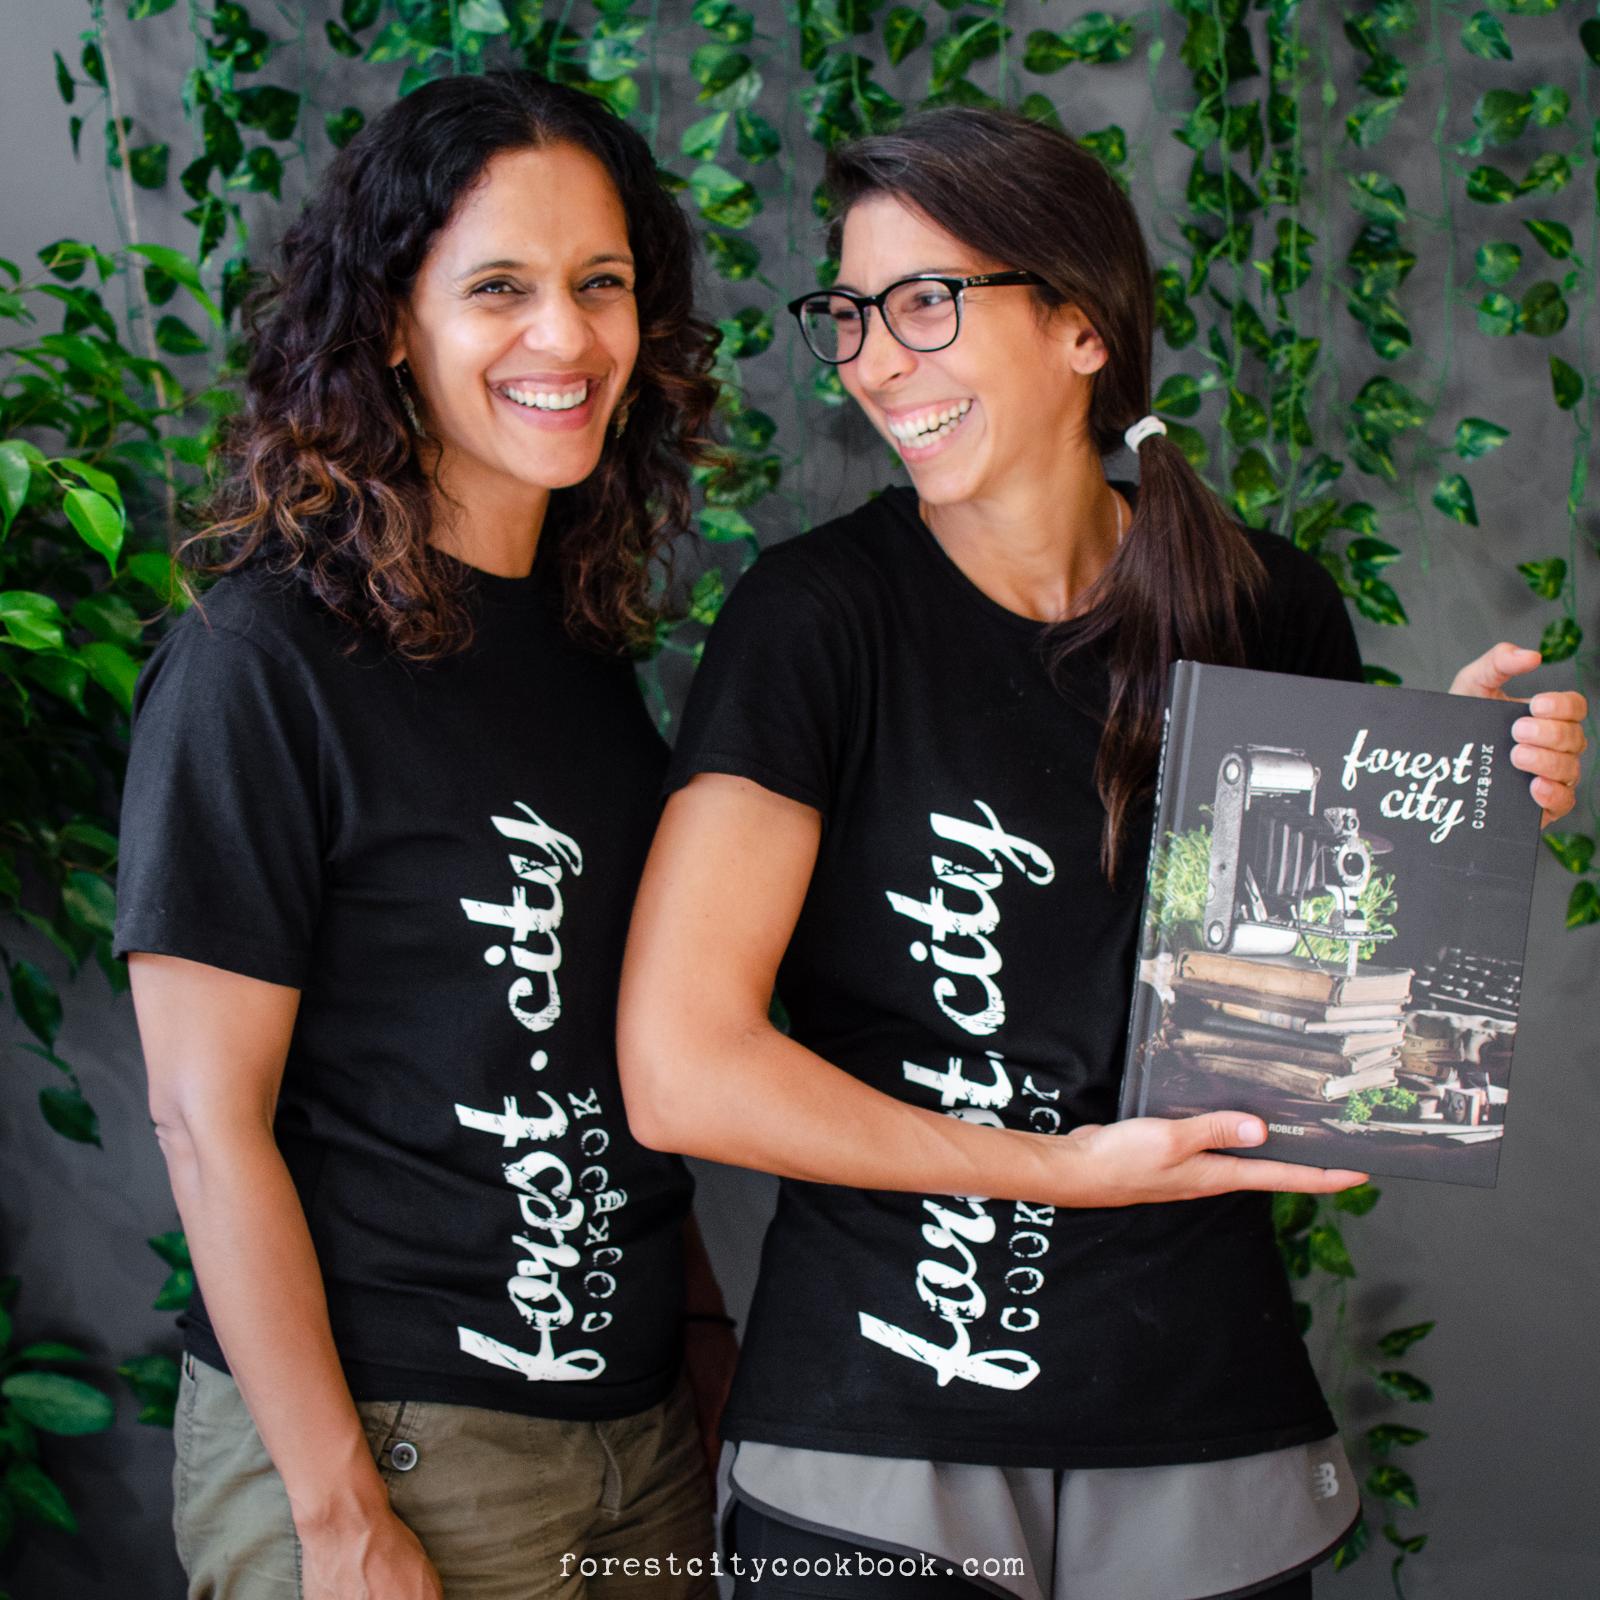 Forest City Cookbook - London Ontario-0343.jpg